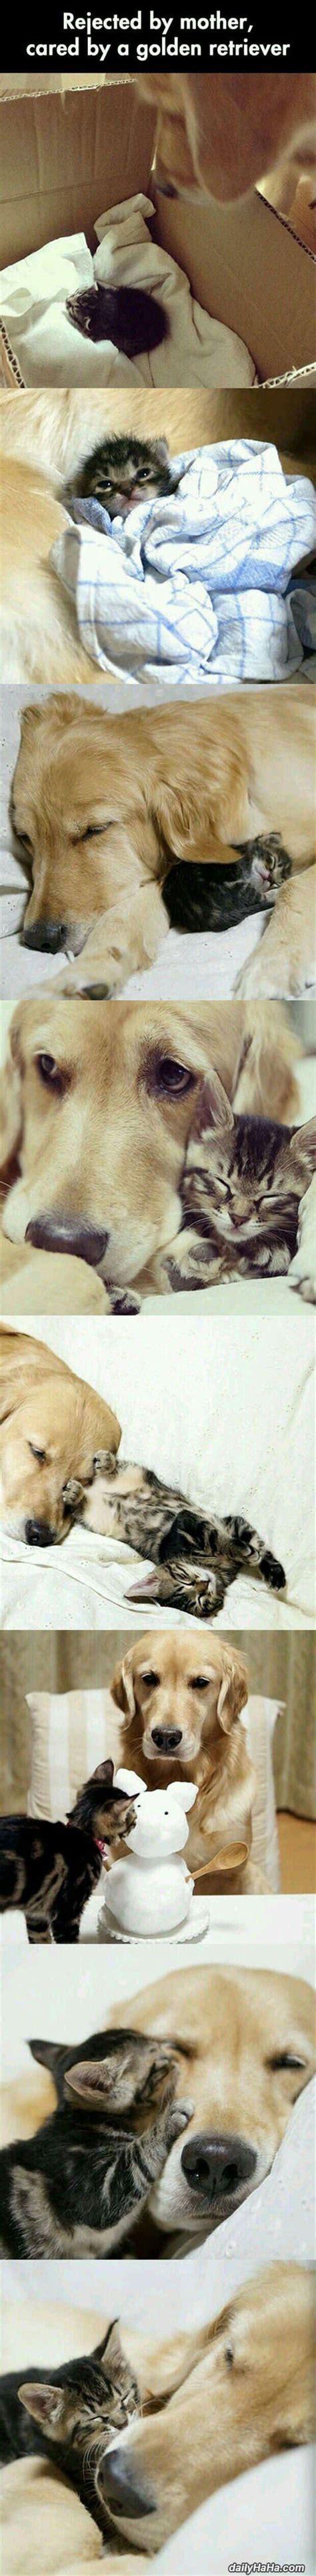 raising golden retrievers golden retriever raising kitten